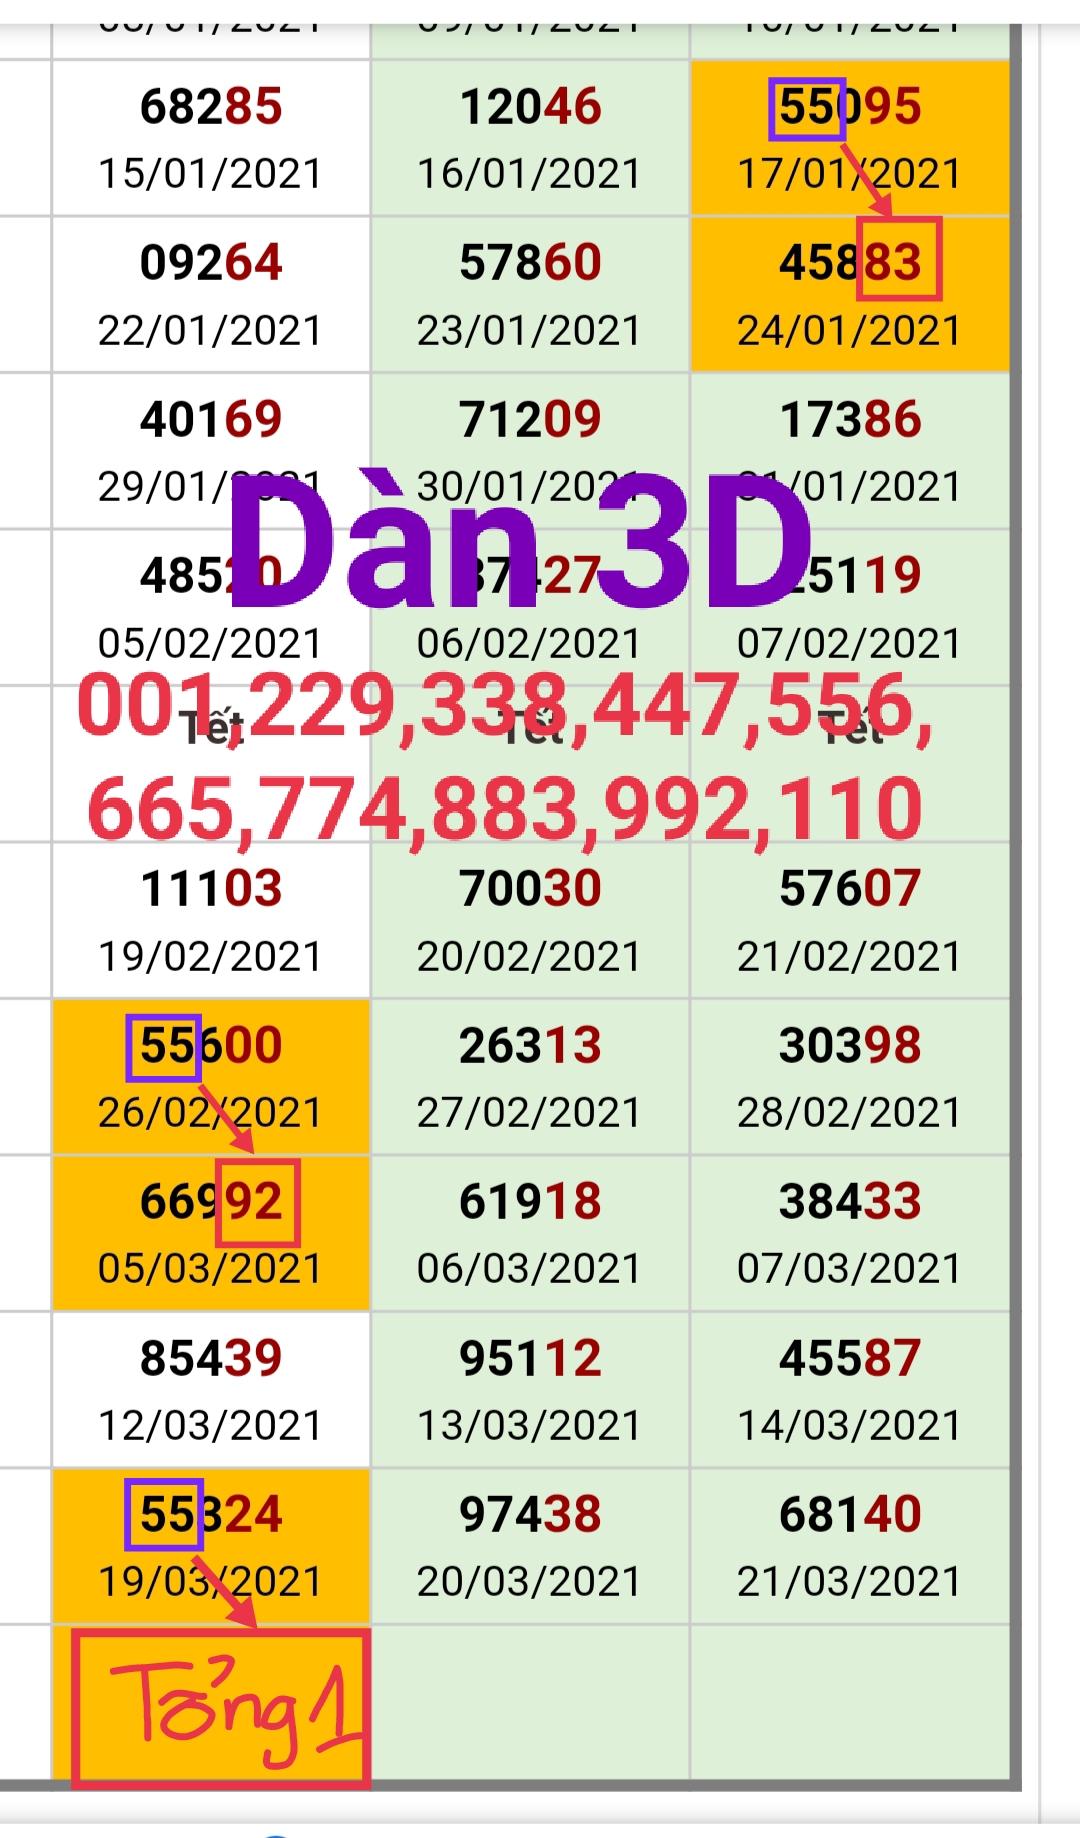 IMG_20210324_211425.jpg